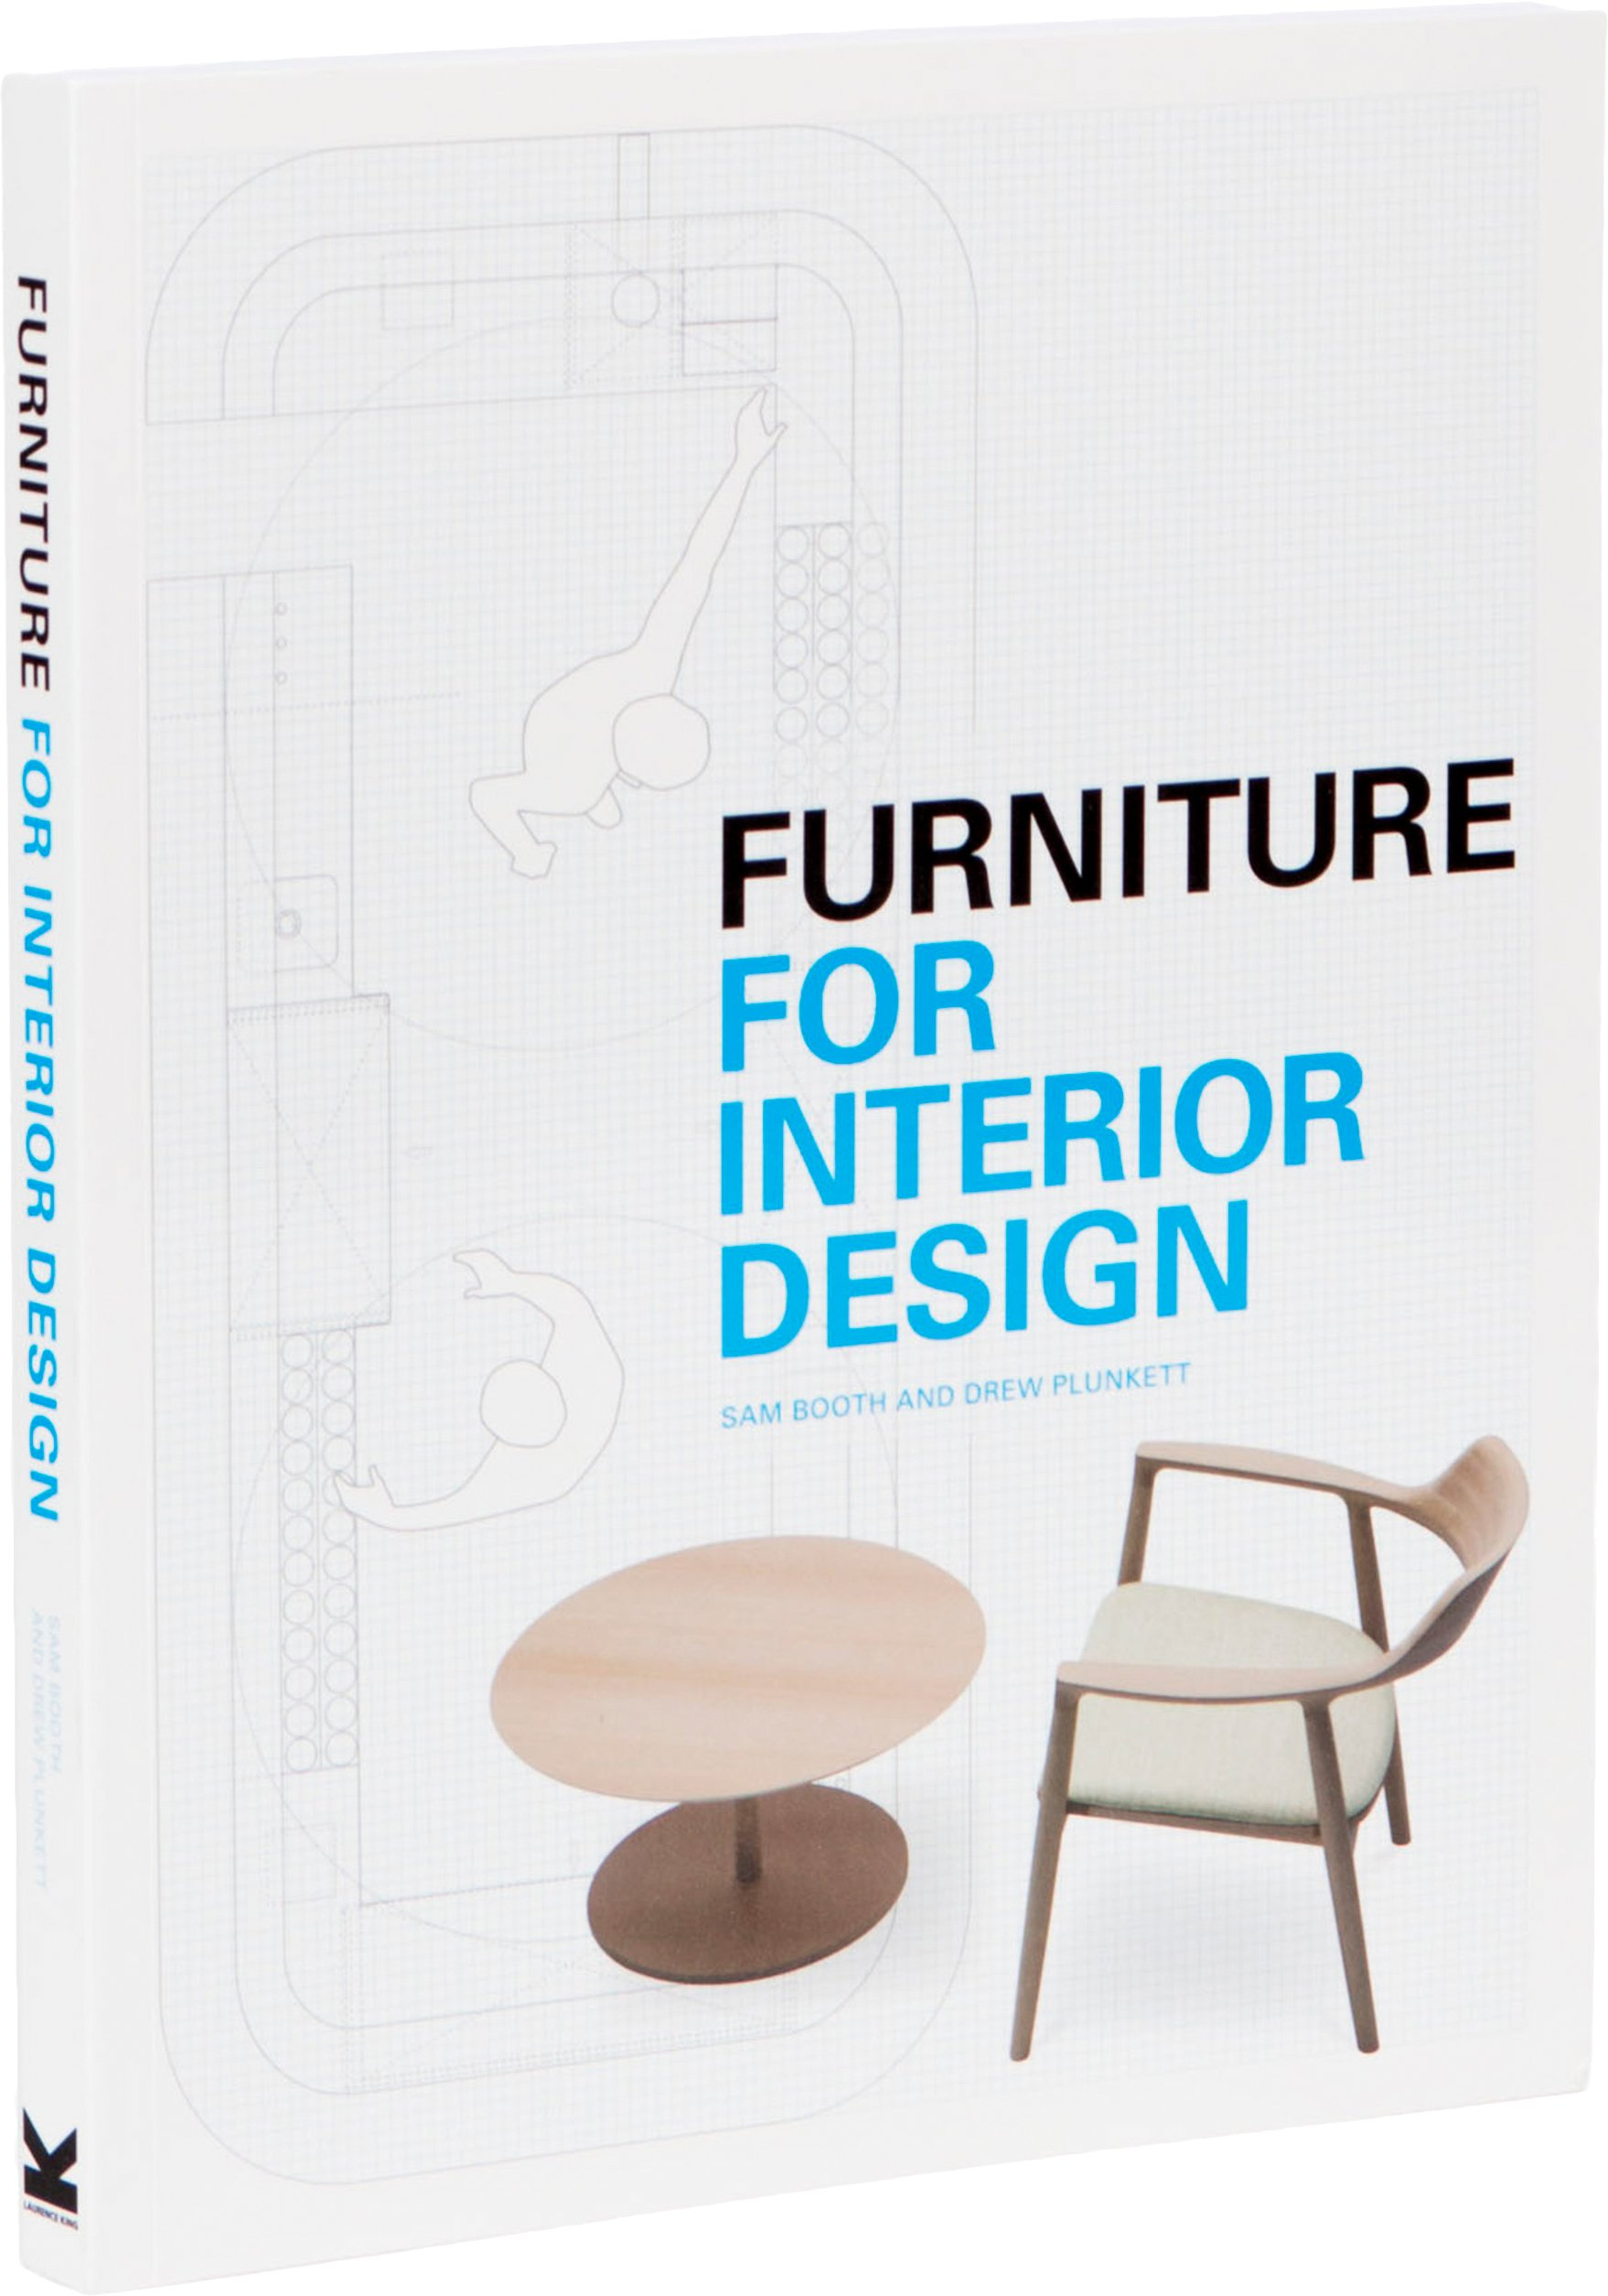 Furniture for Interior Design: Amazon.de: Drew Plunkett, Sam Booth ...